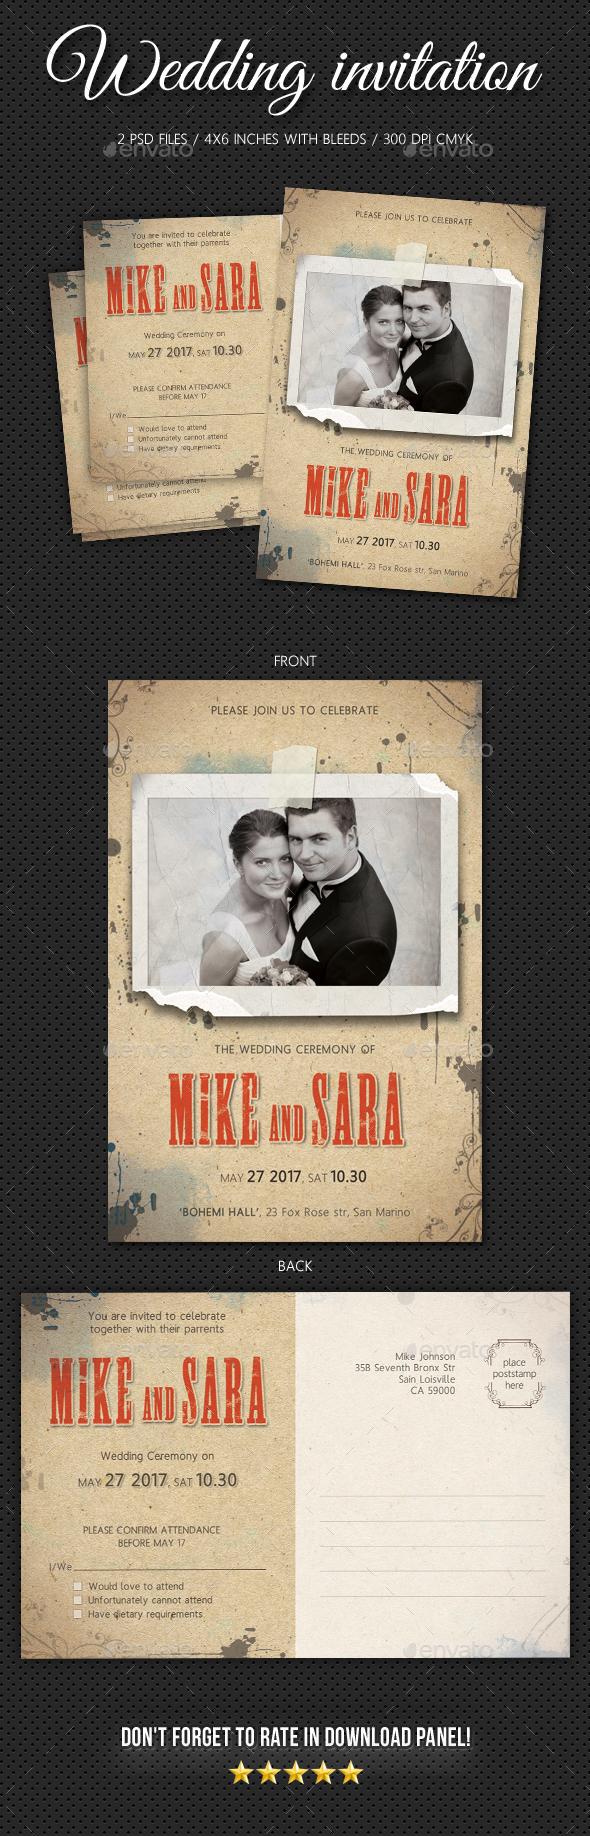 Wedding Invitation V6 - Weddings Cards & Invites